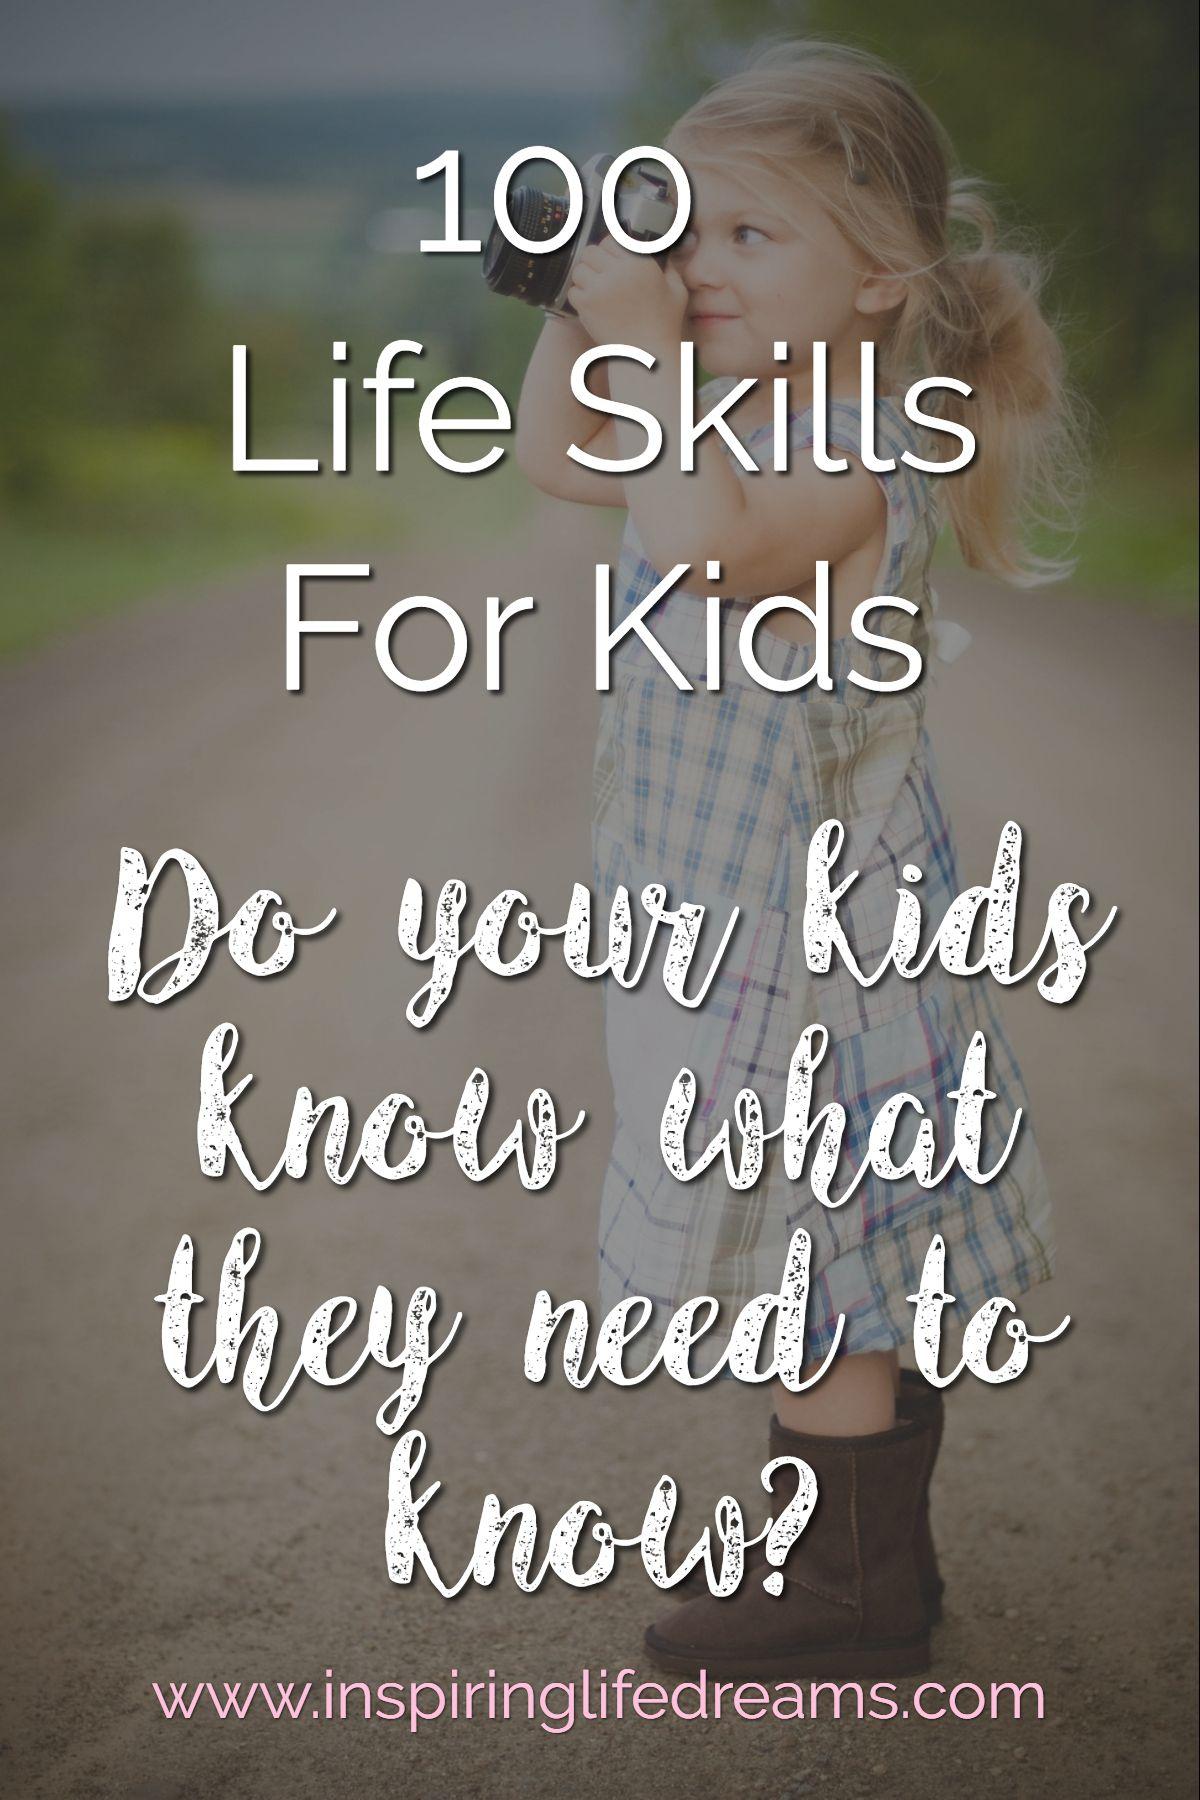 100 Life Skills For Kids